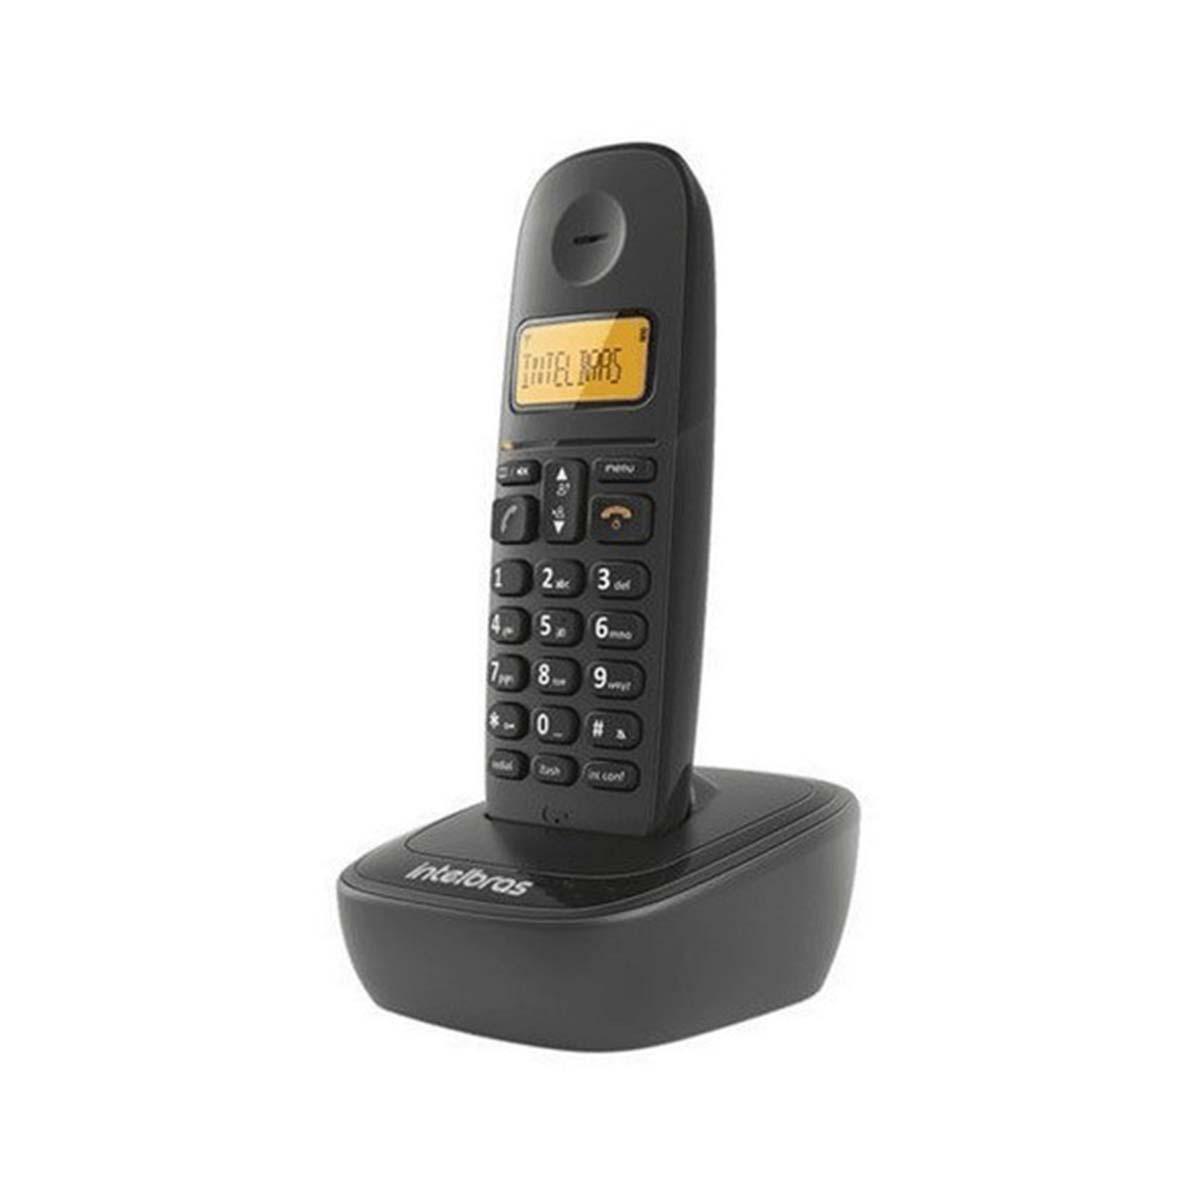 Kit 06 Telefone Sem Fio Intelbras Ts 2510 Preto